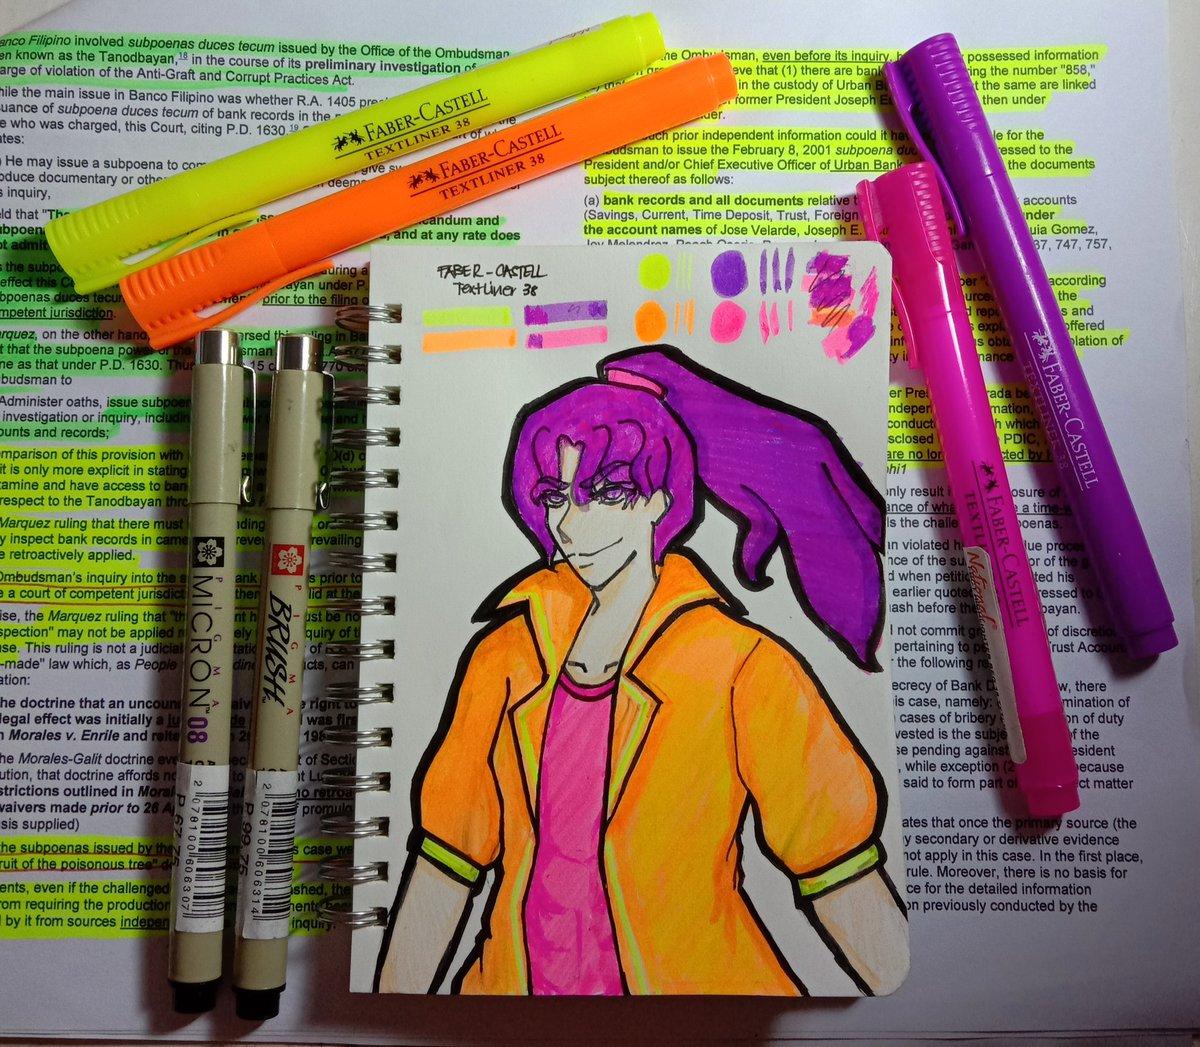 Took a break from studying...  #art2020 #artoftheday #art #artist #artph #artwork #artlover #arts #drawingoftheday #drawingsketch #drawings #drawsomething #pens #highlighter #textliner #fabercastellpic.twitter.com/L105NpD9RR